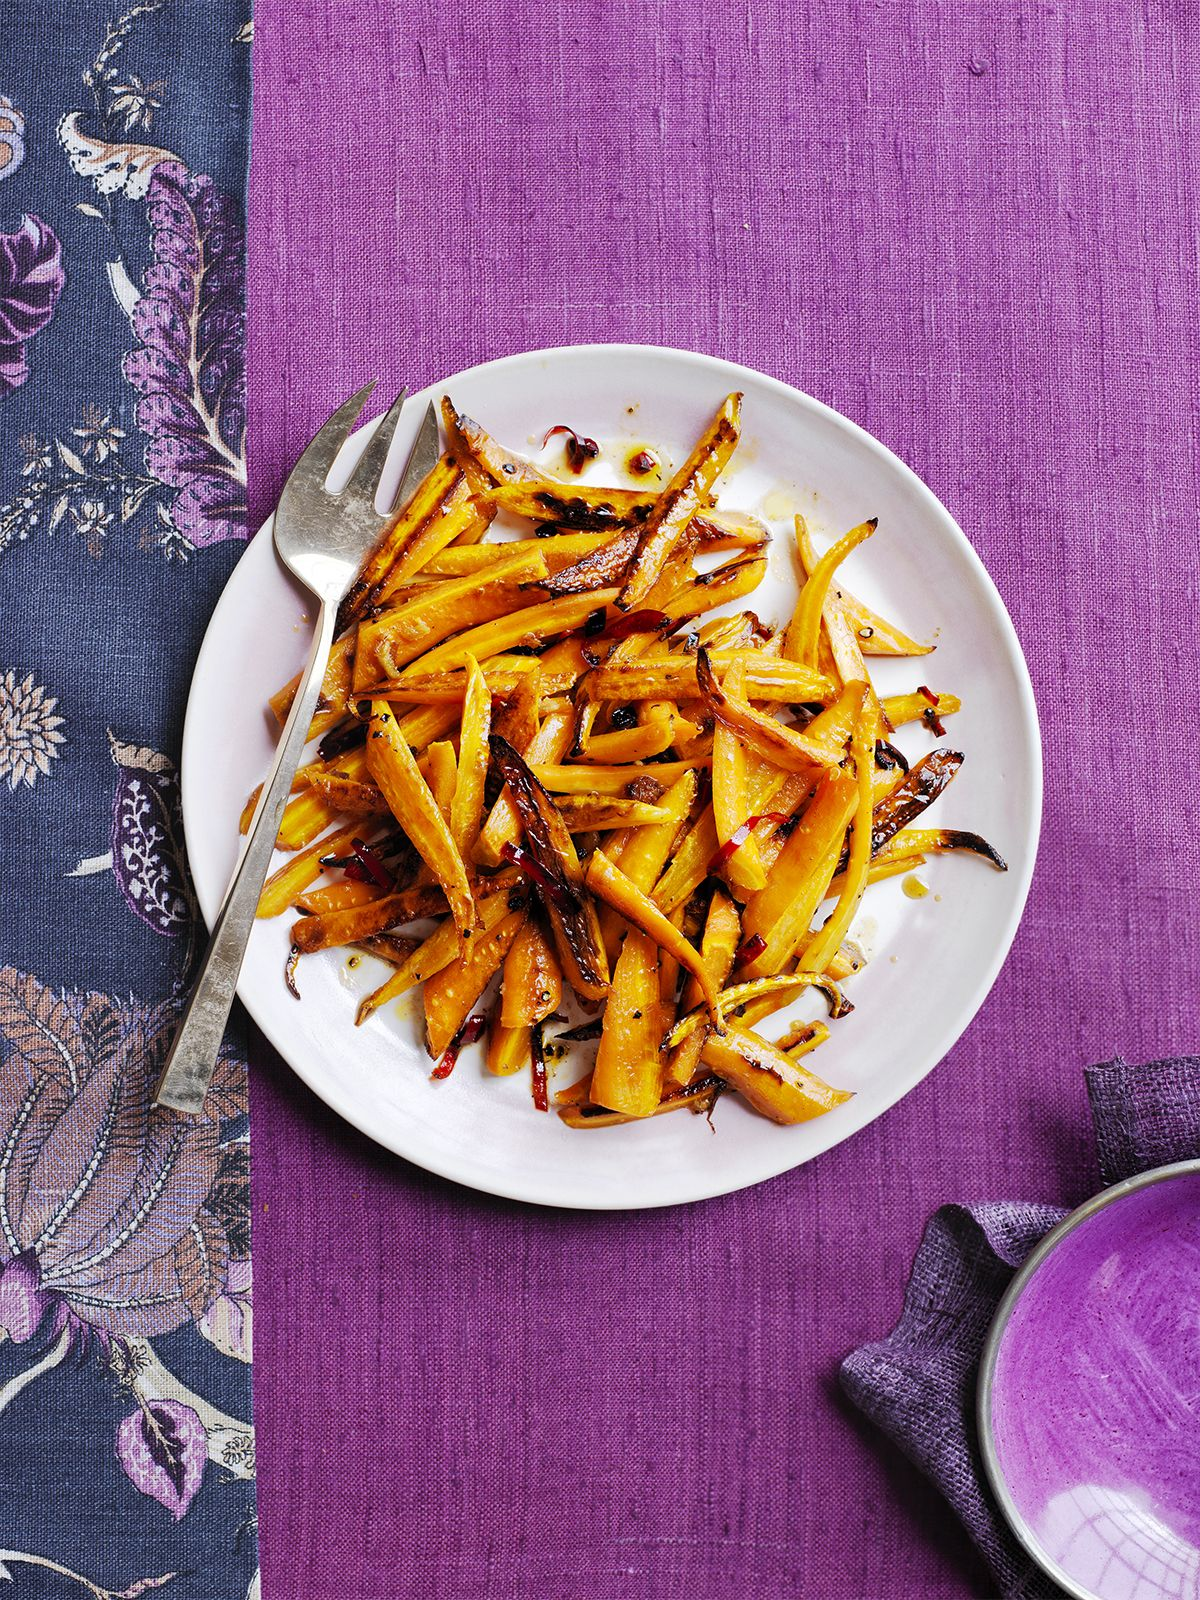 Honey-Glazed Roasted Carrots